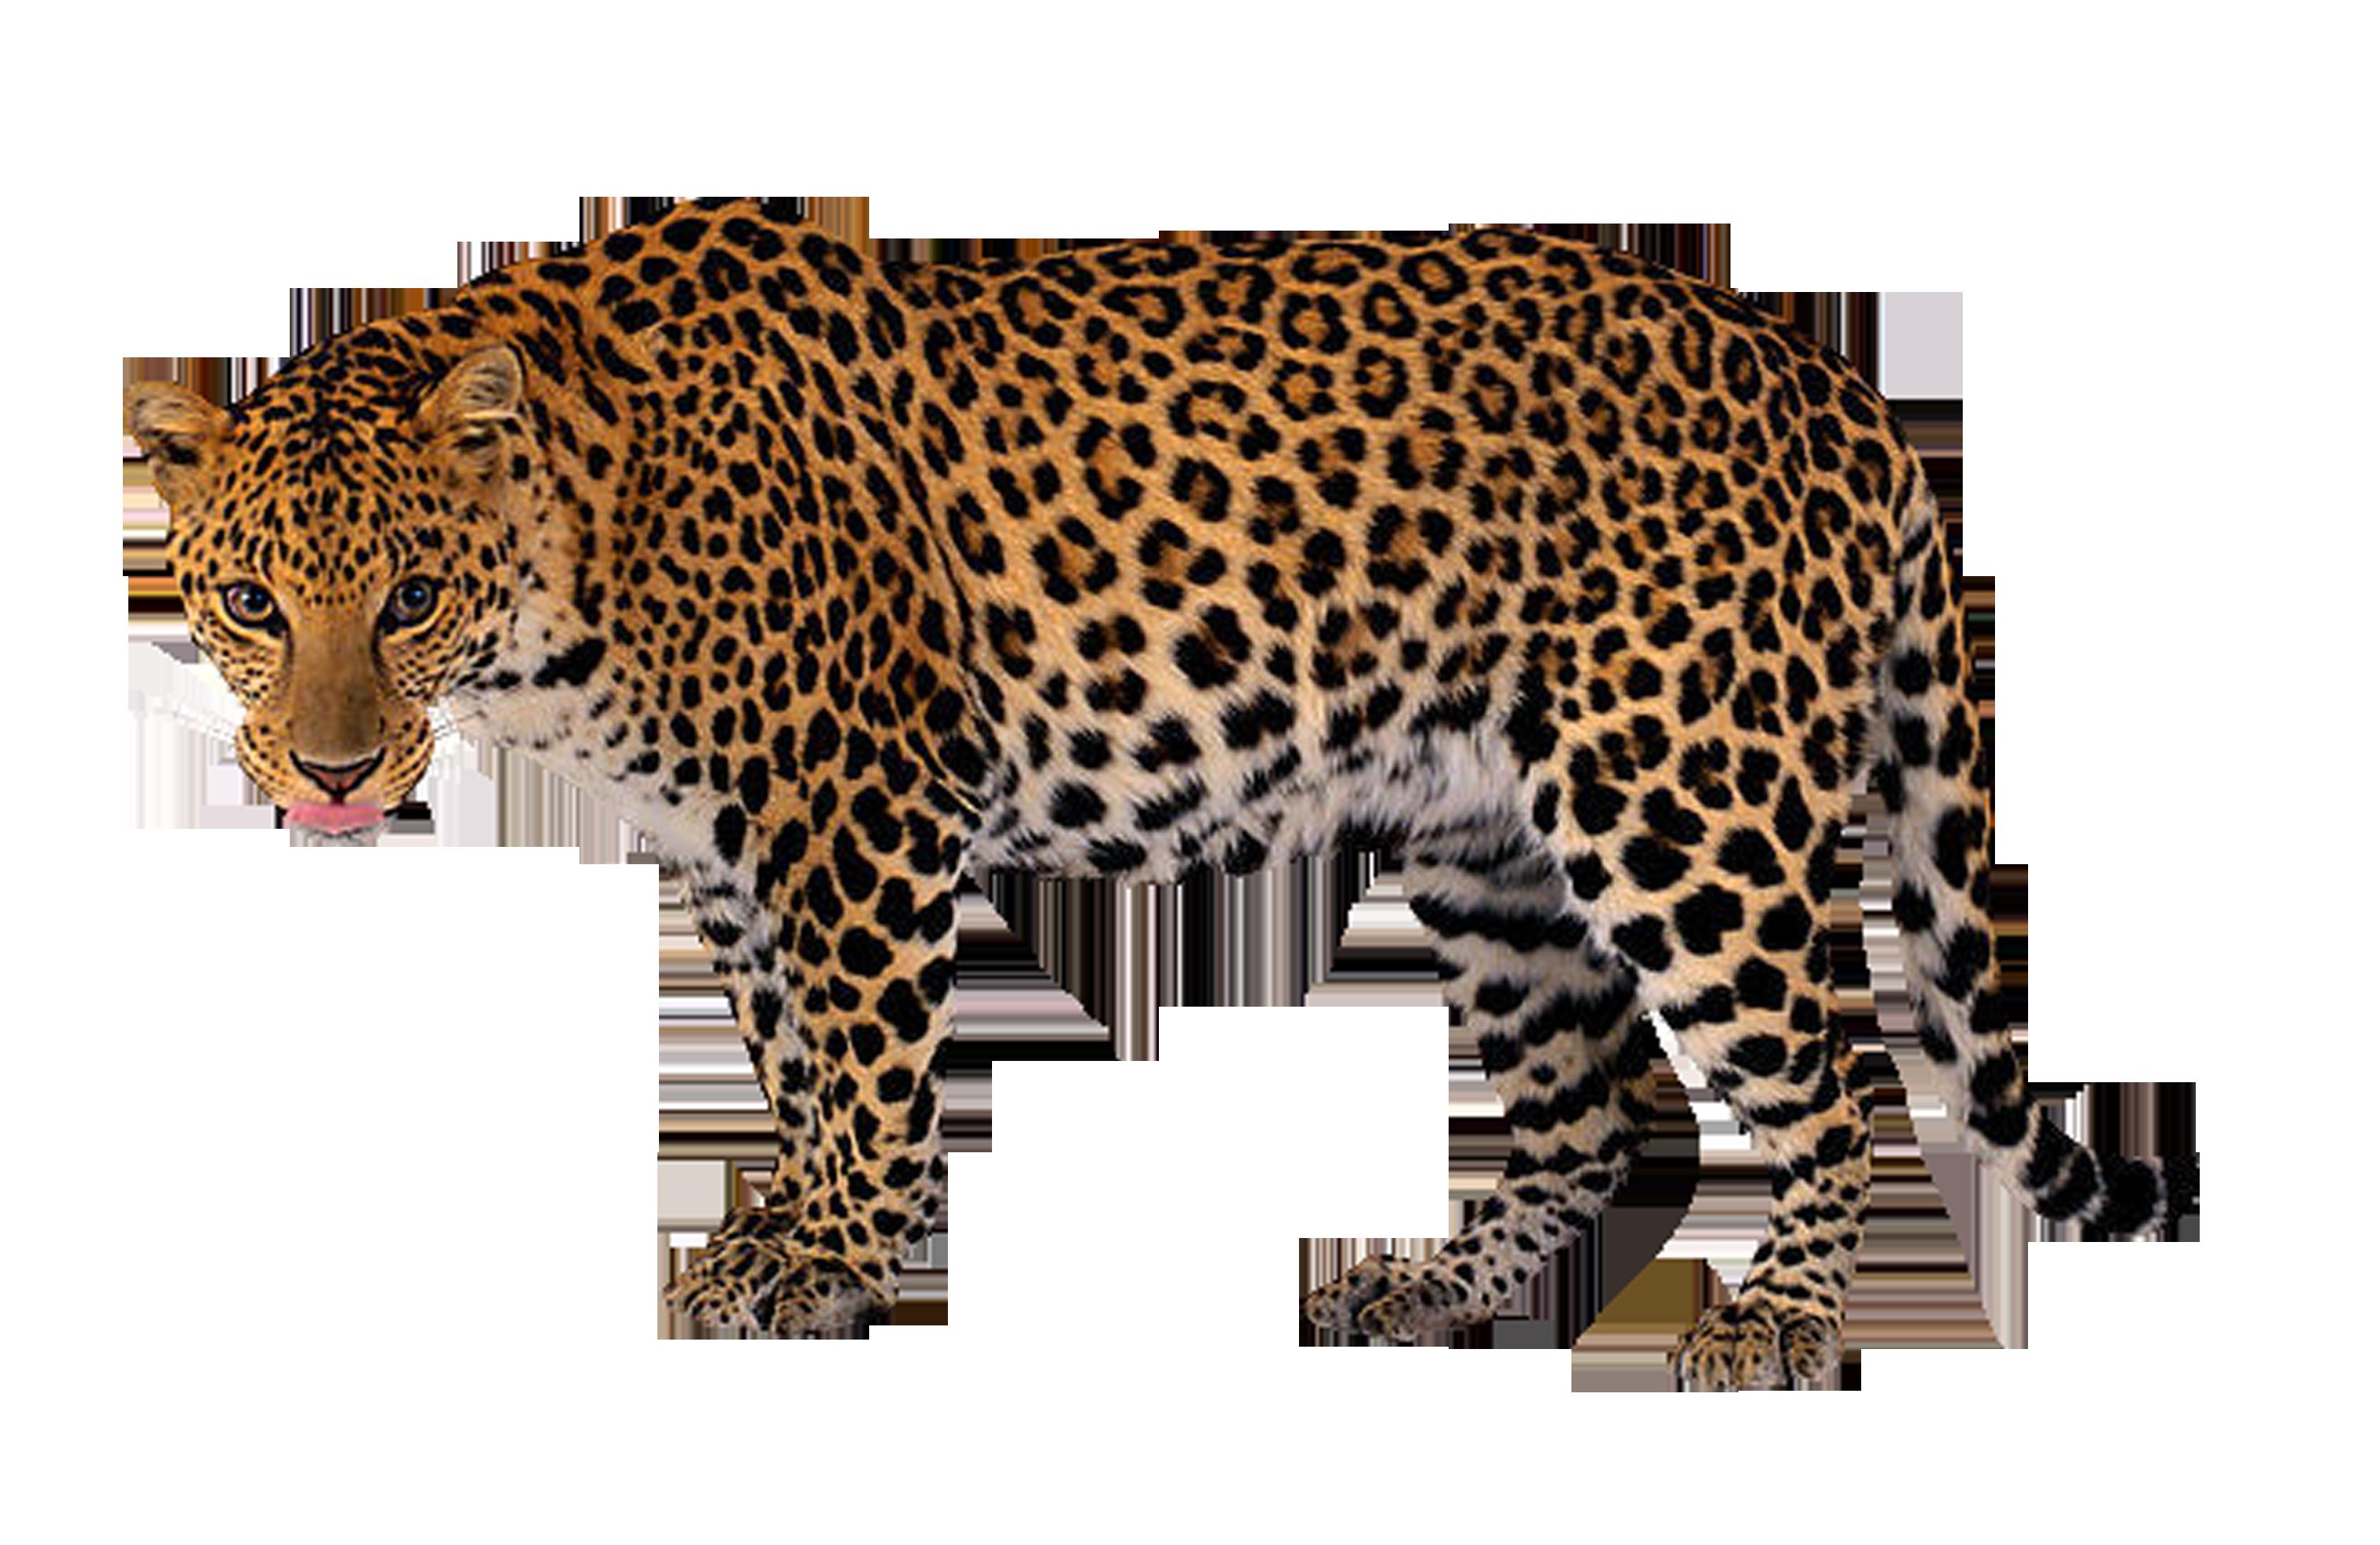 3023x1963 Leopard Clip Art